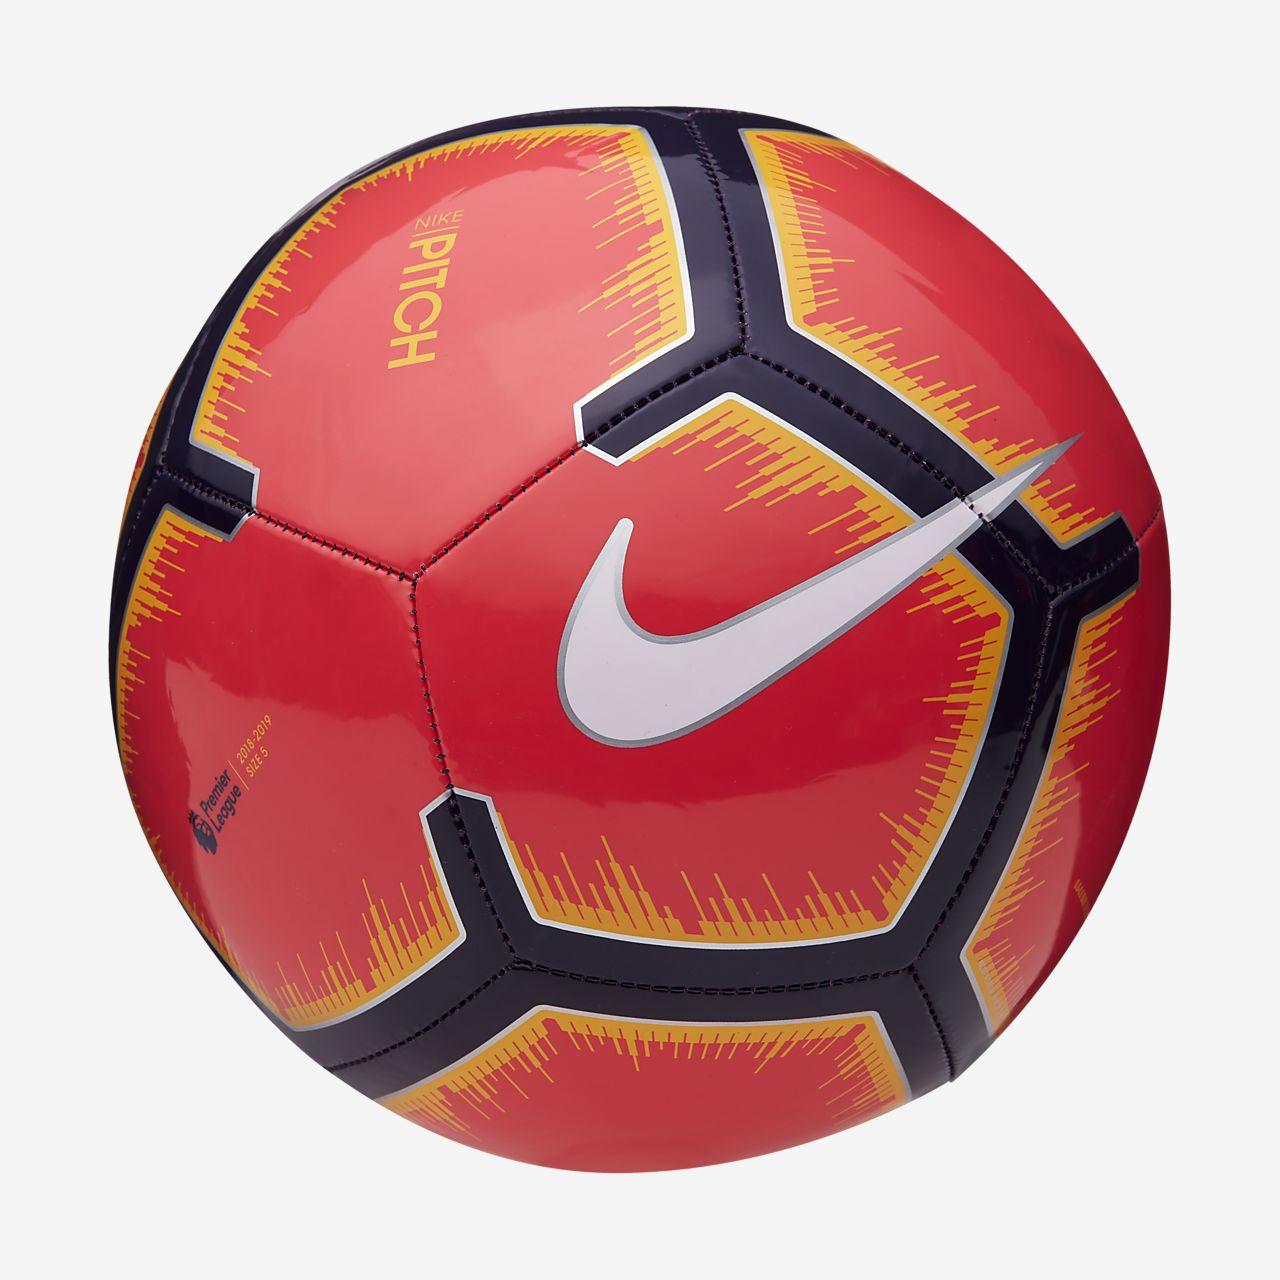 d5aae0fd6fbaf Balón de fútbol Premier League Pitch. Nike.com MX